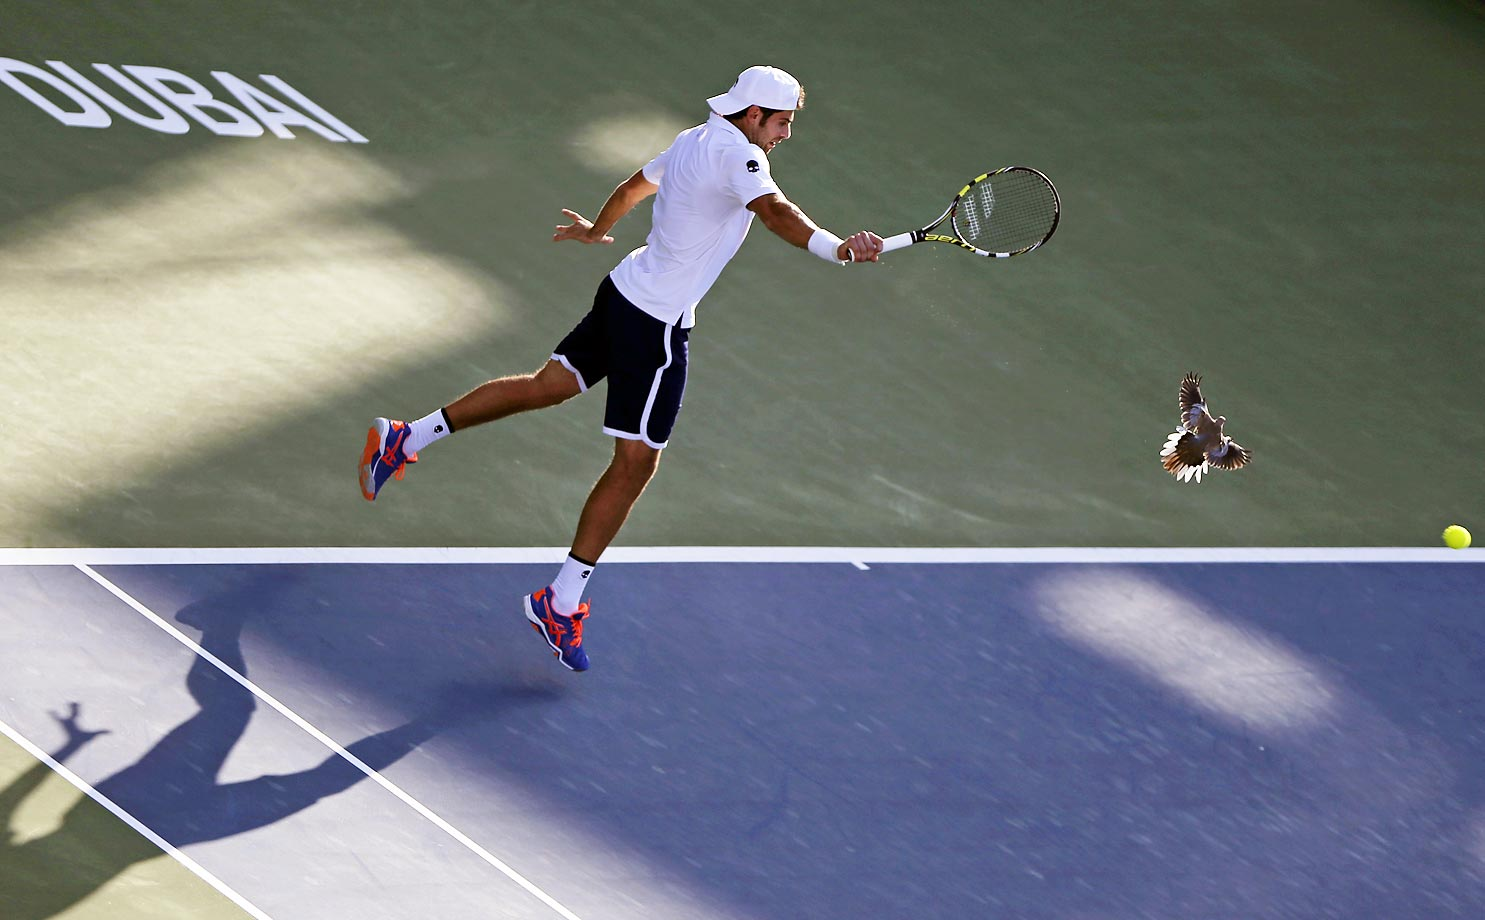 Simone Bolelli returns the ball (and pigeon?) to Tomas Berdych during the Dubai Duty Free Tennis Championships.